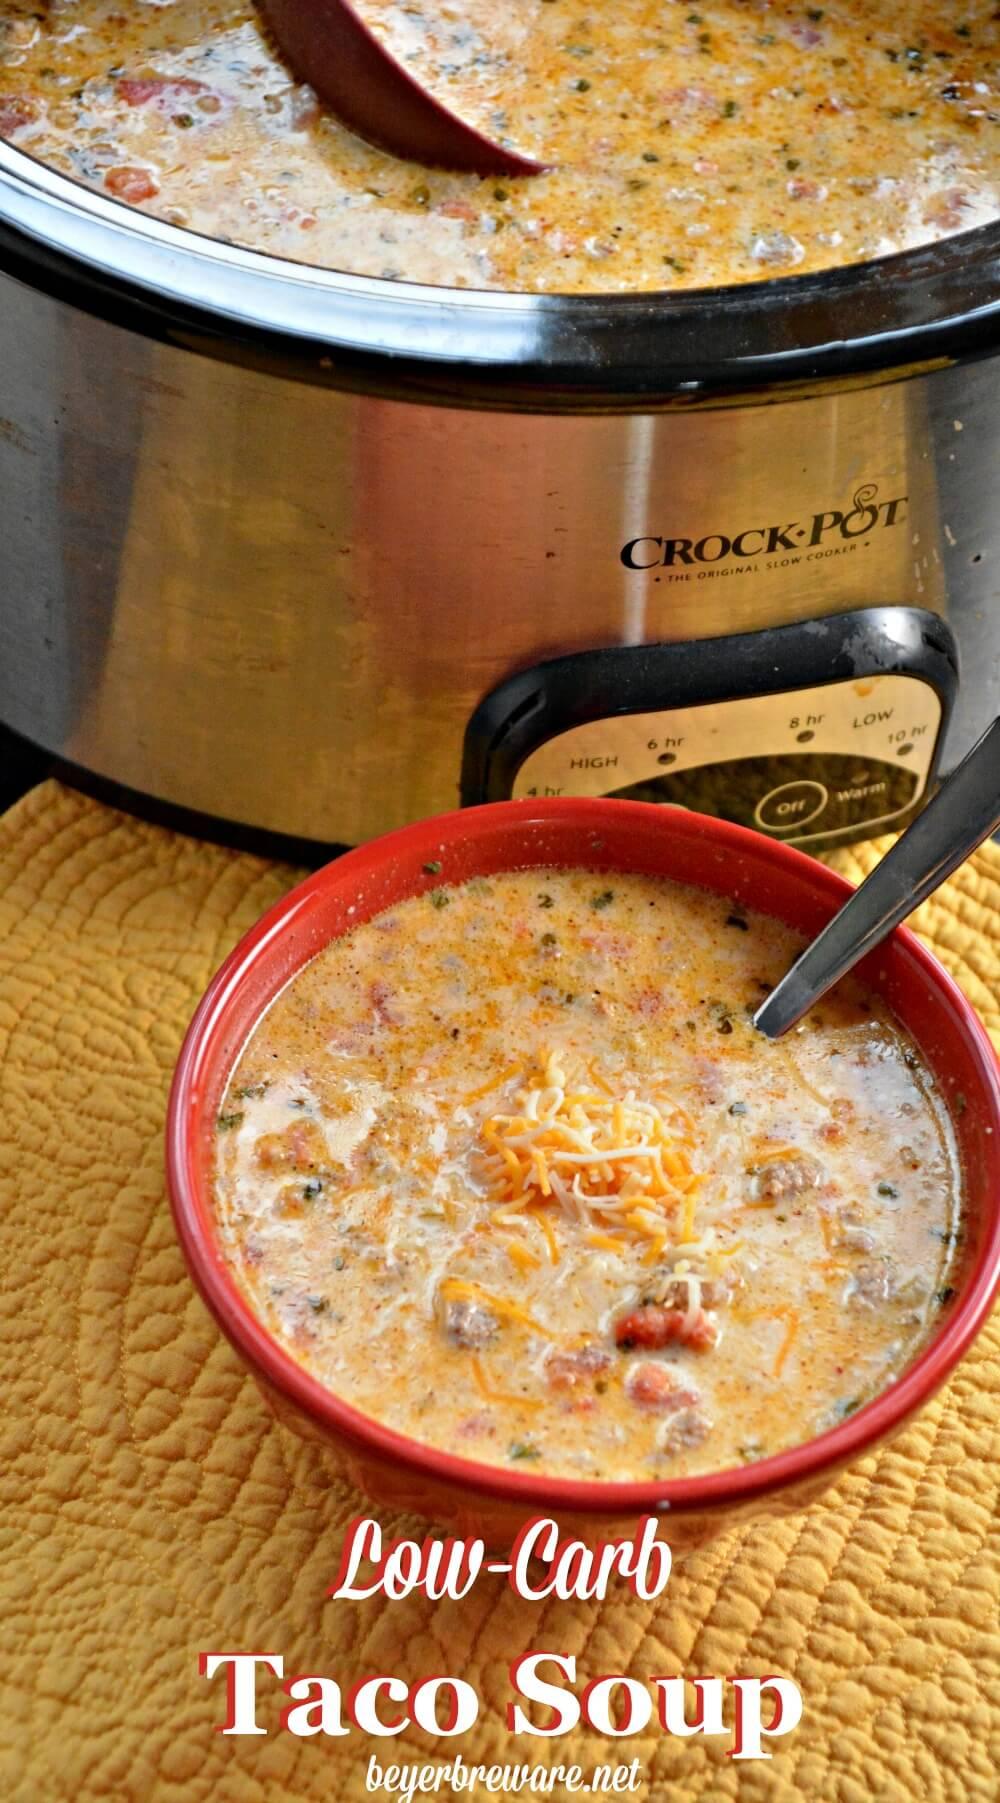 Nutritious Keto Crockpot Recipes: Keto Crockpot Soup